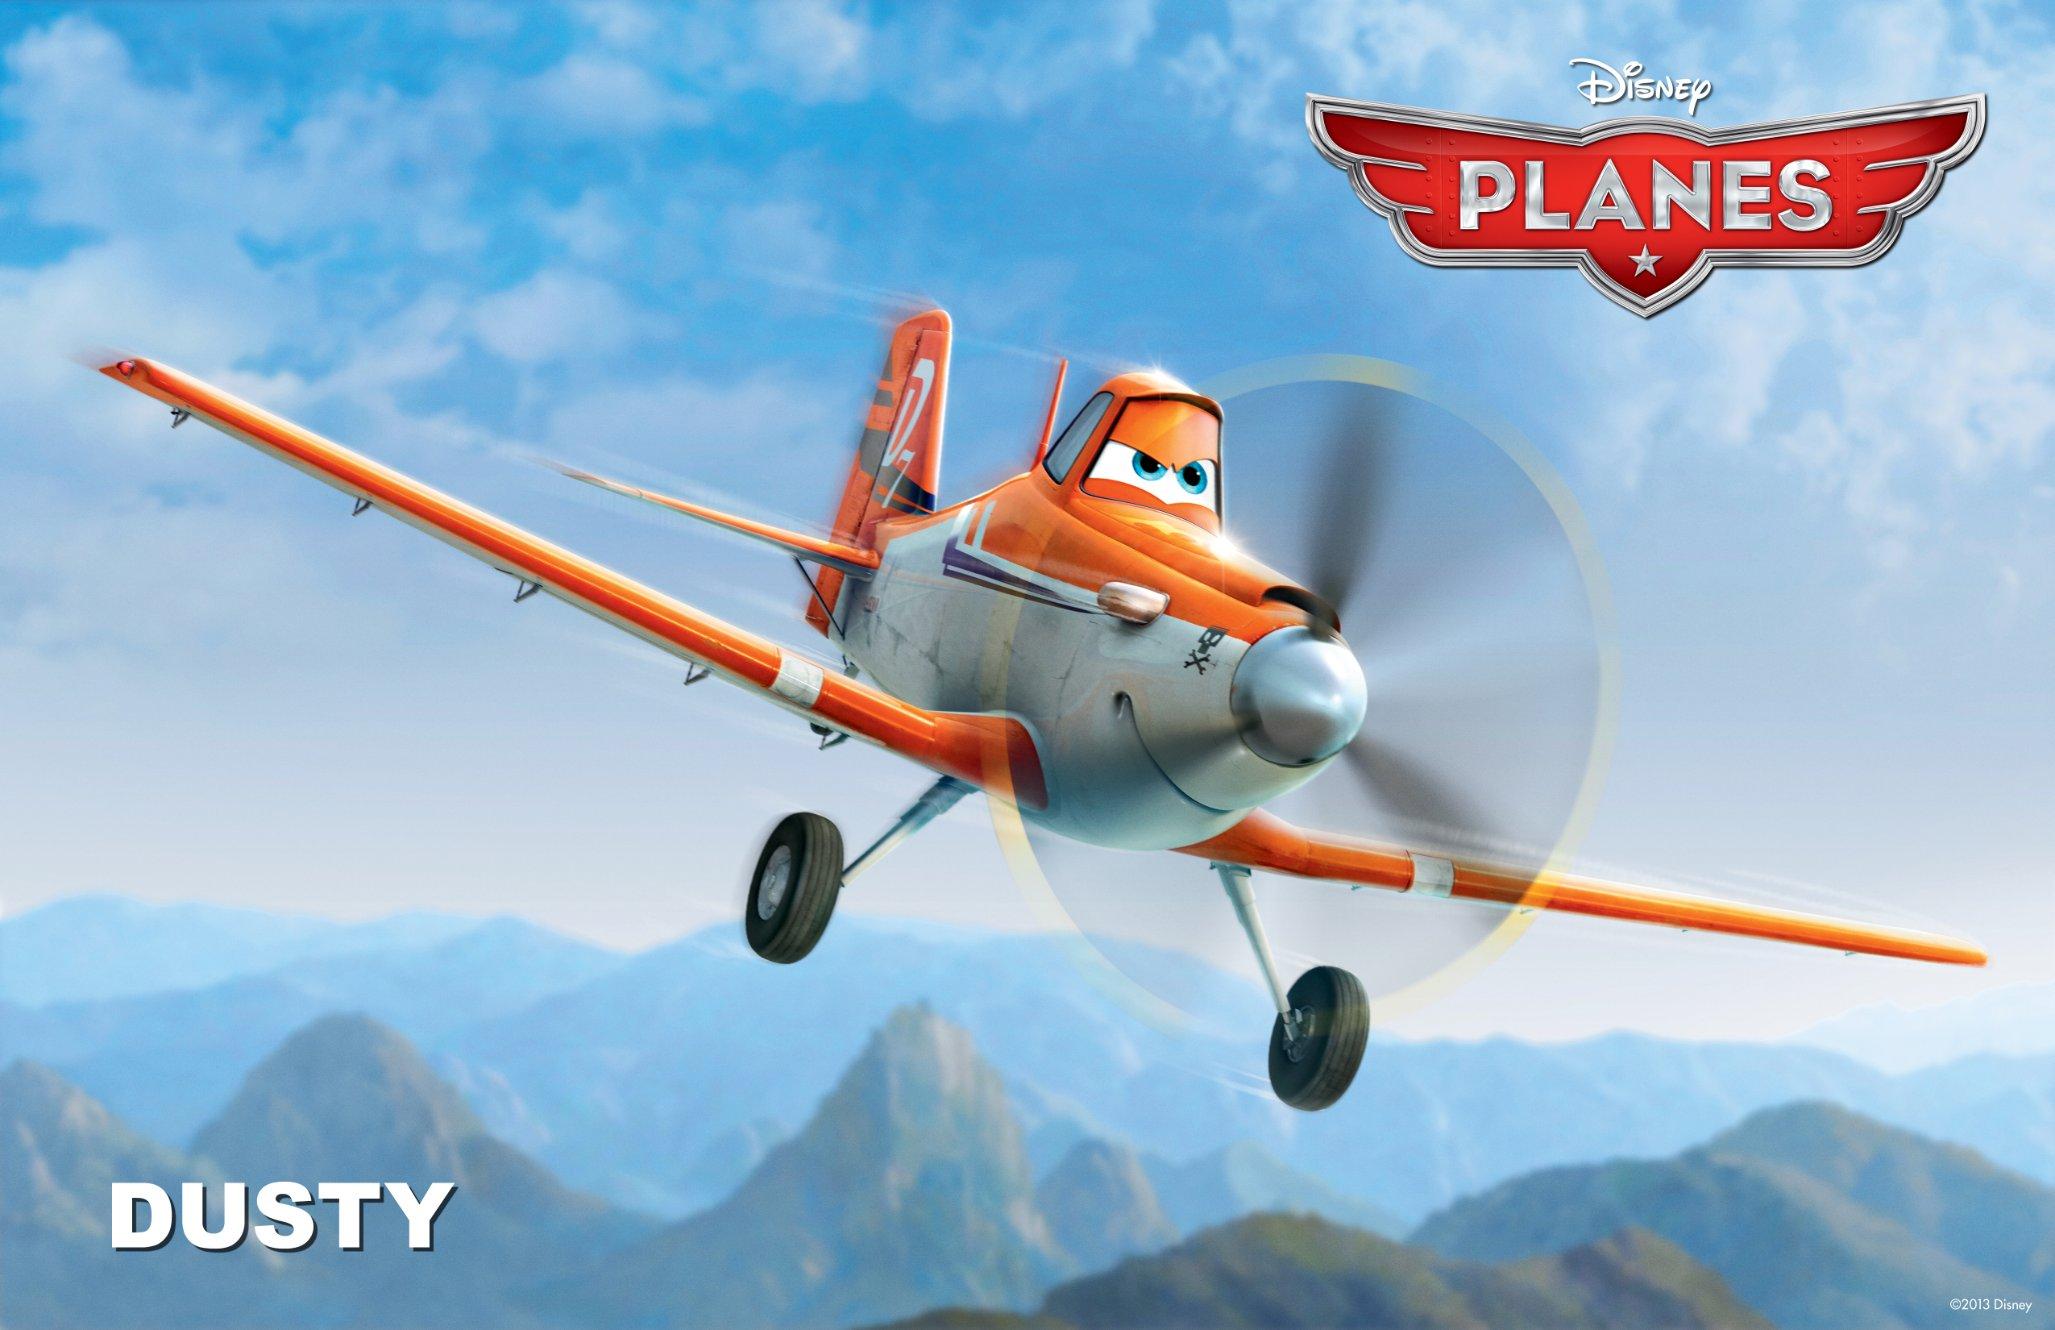 Uncategorized Dusty Planes meet the pilot who kept disneys film planes flying right cnn travel